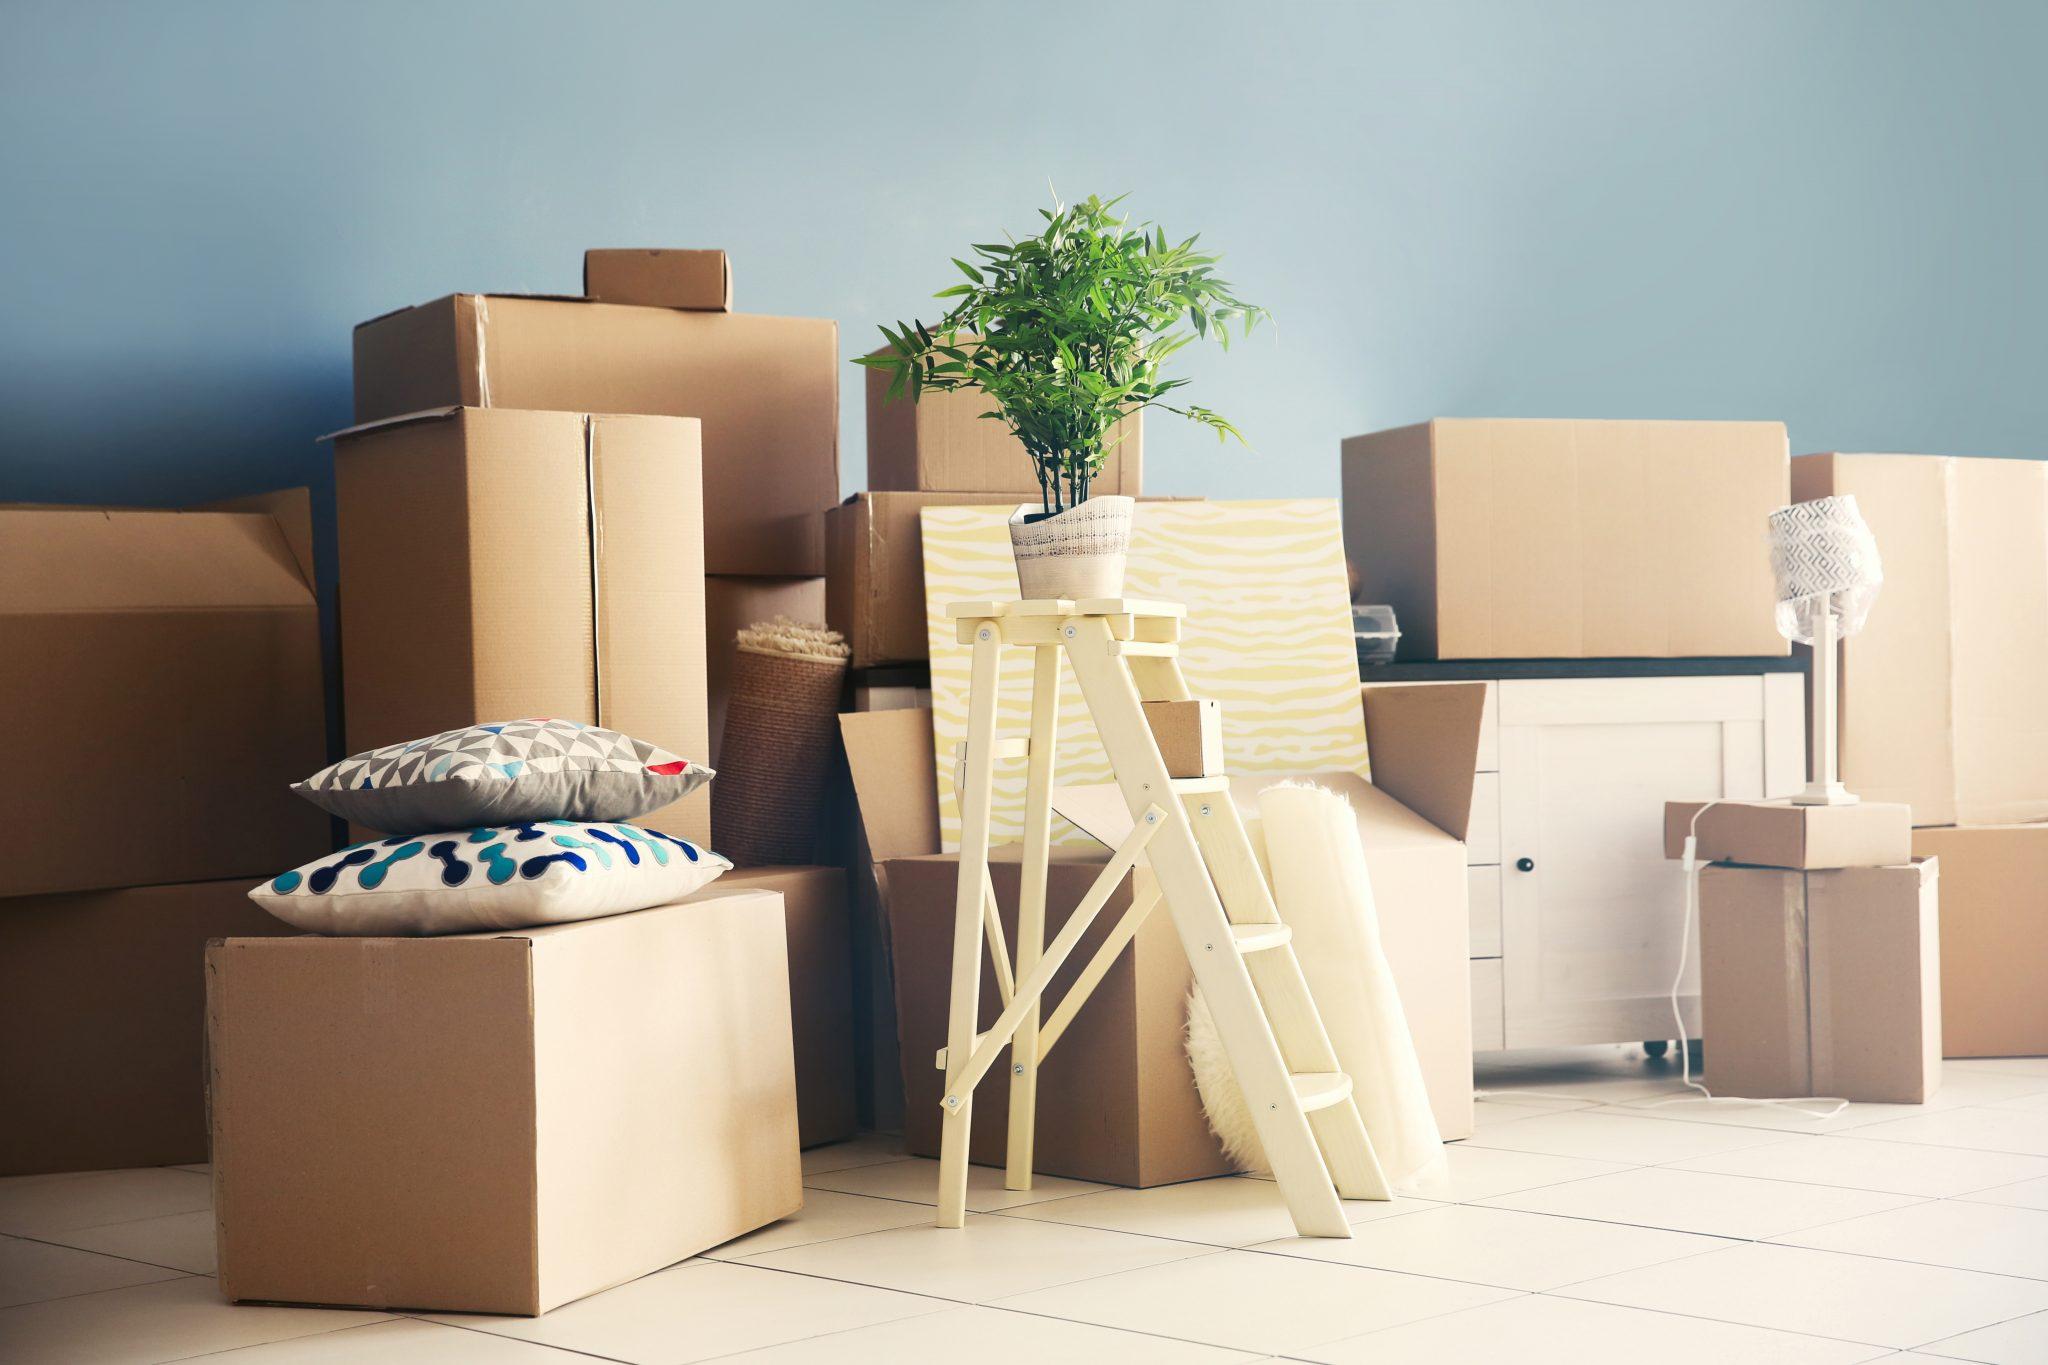 movers in burlington